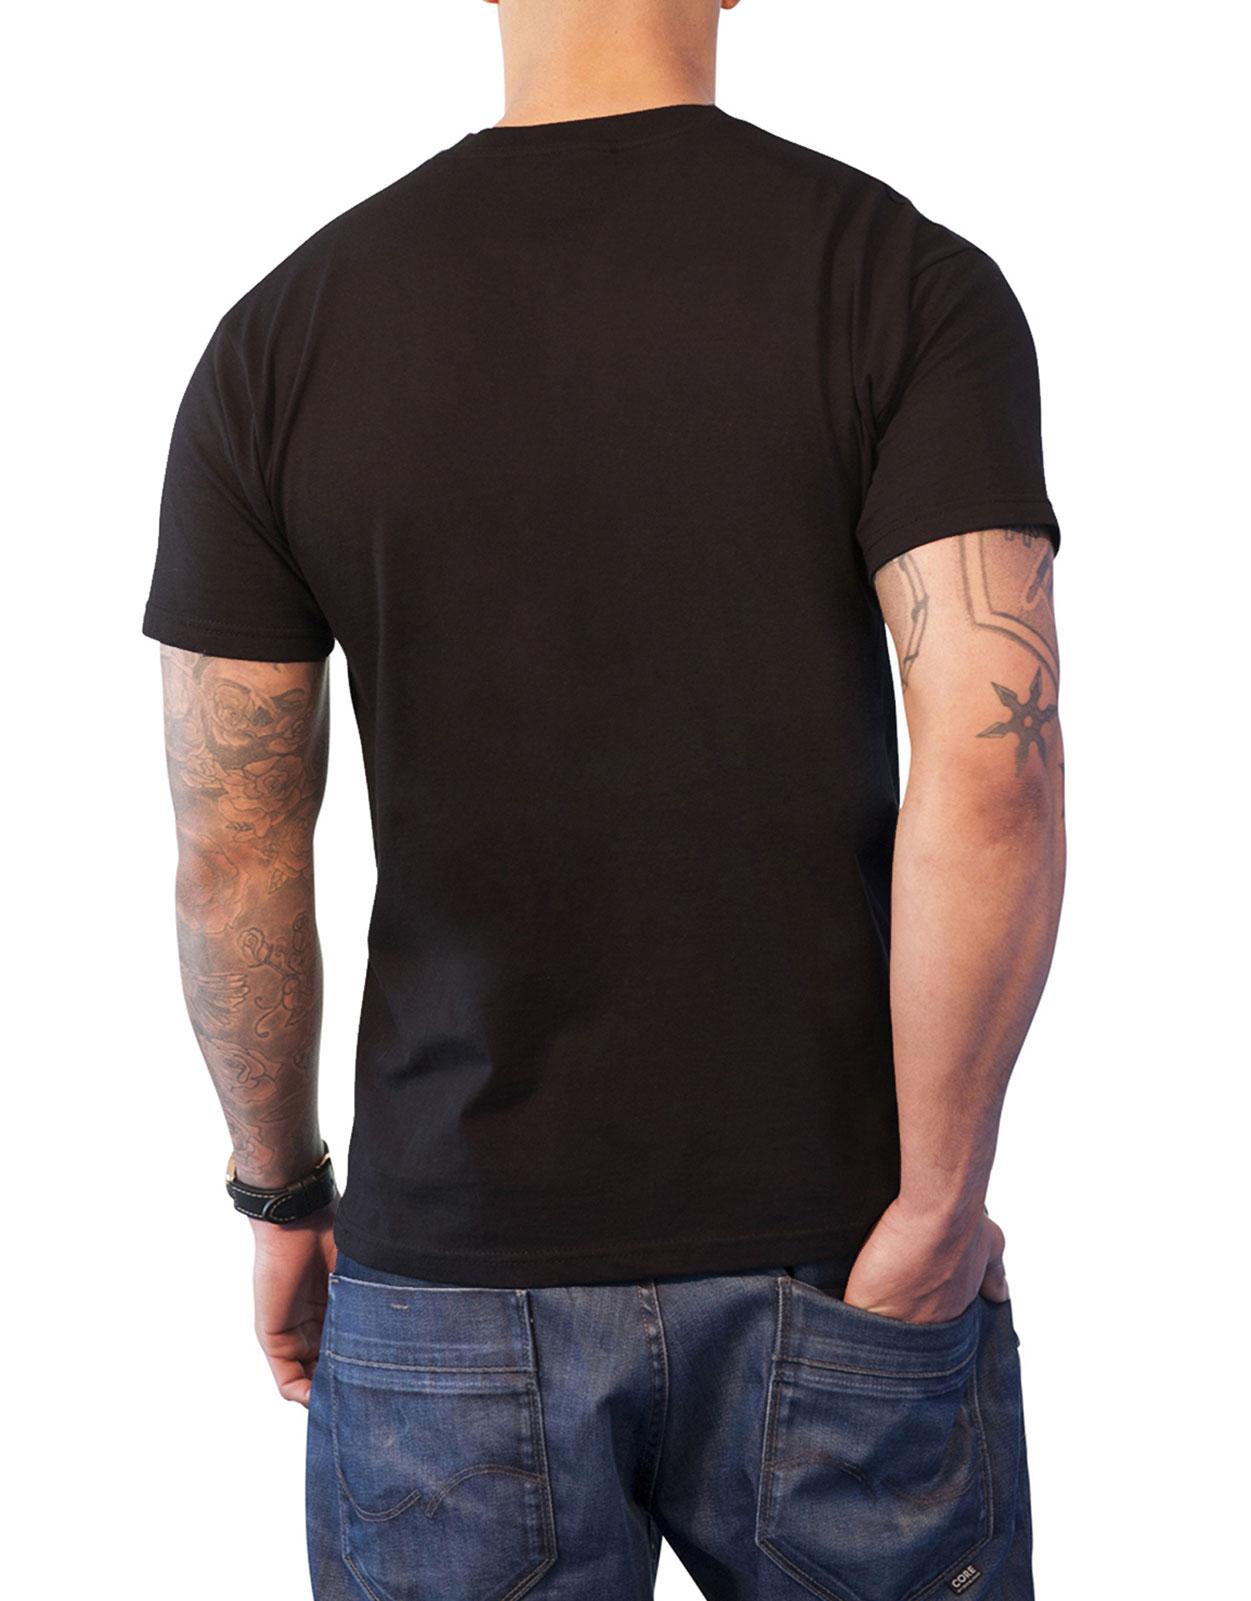 Camiseta-Last-Jedi-De-Star-Wars-Movie-Poster-porgs-Guardia-pretoriana-oficial-para-hombre miniatura 31